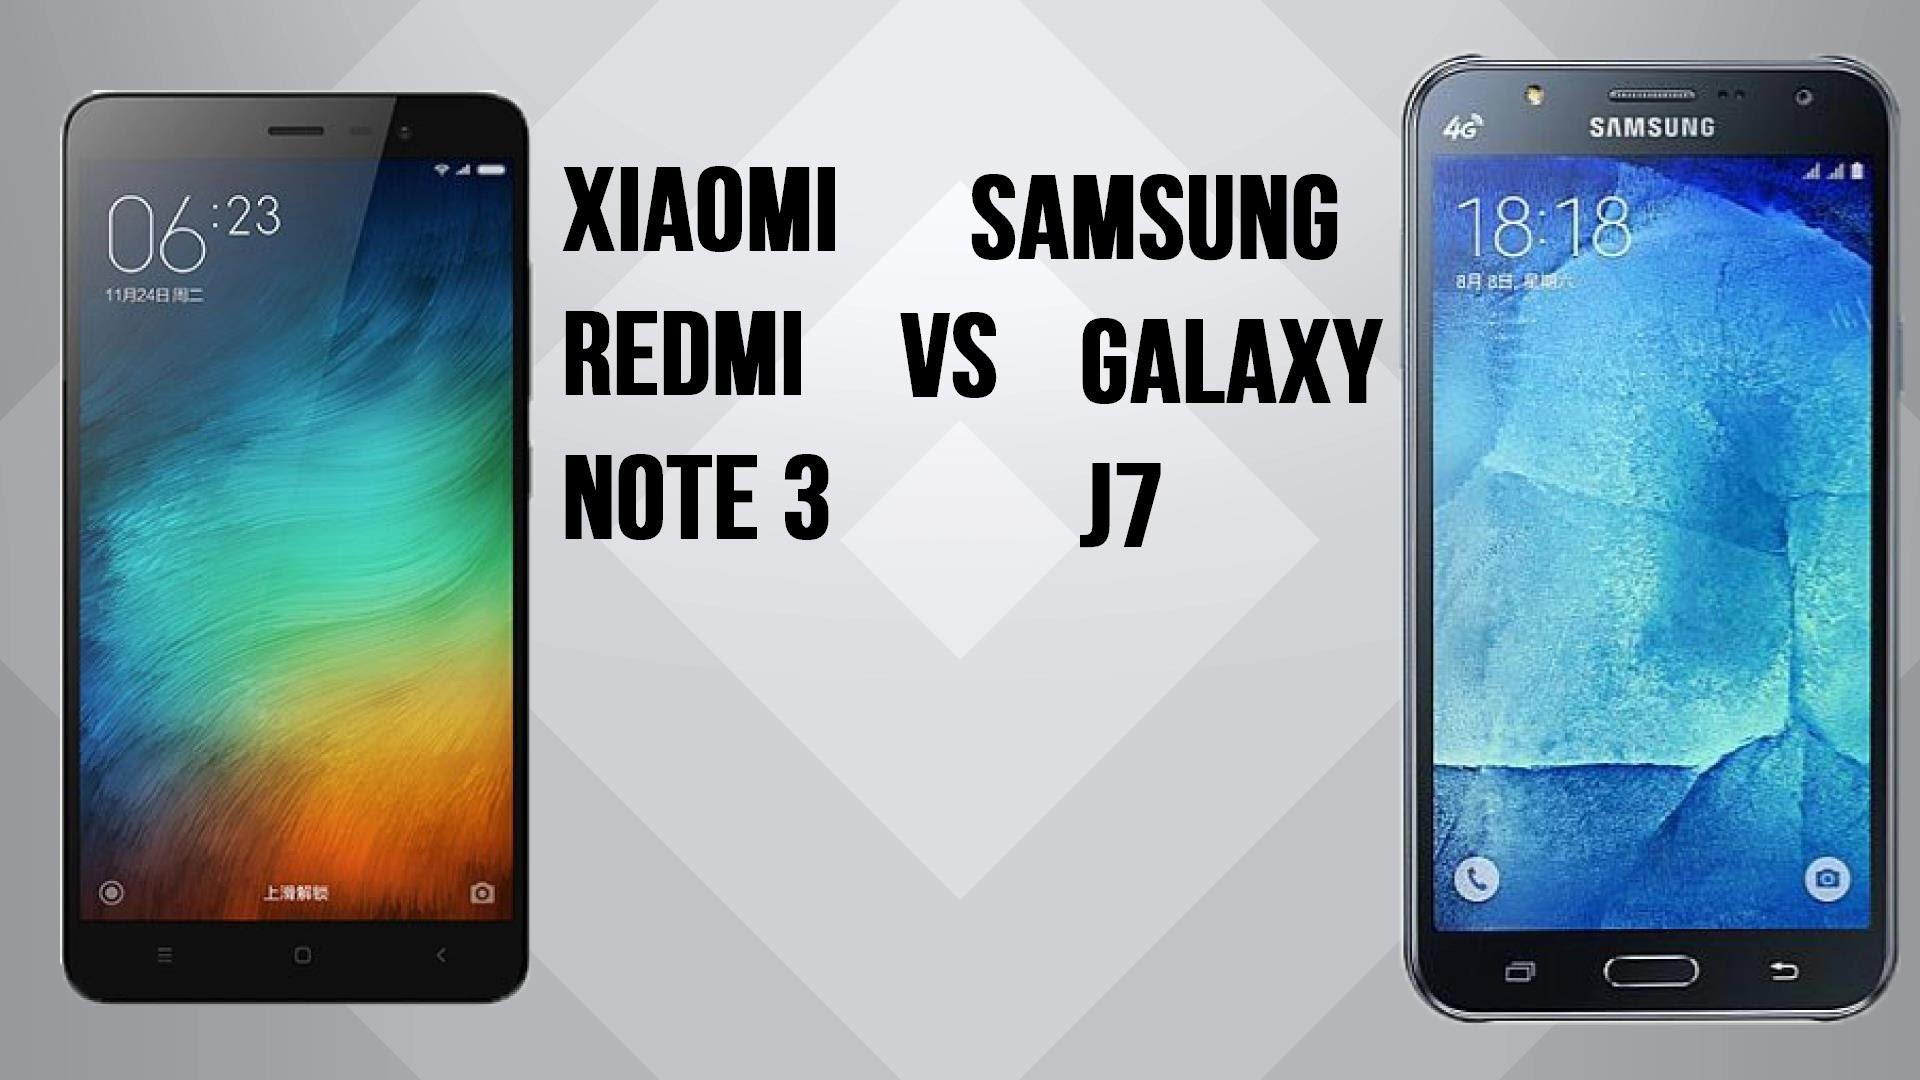 j7 vs redmi note 3 Samsung